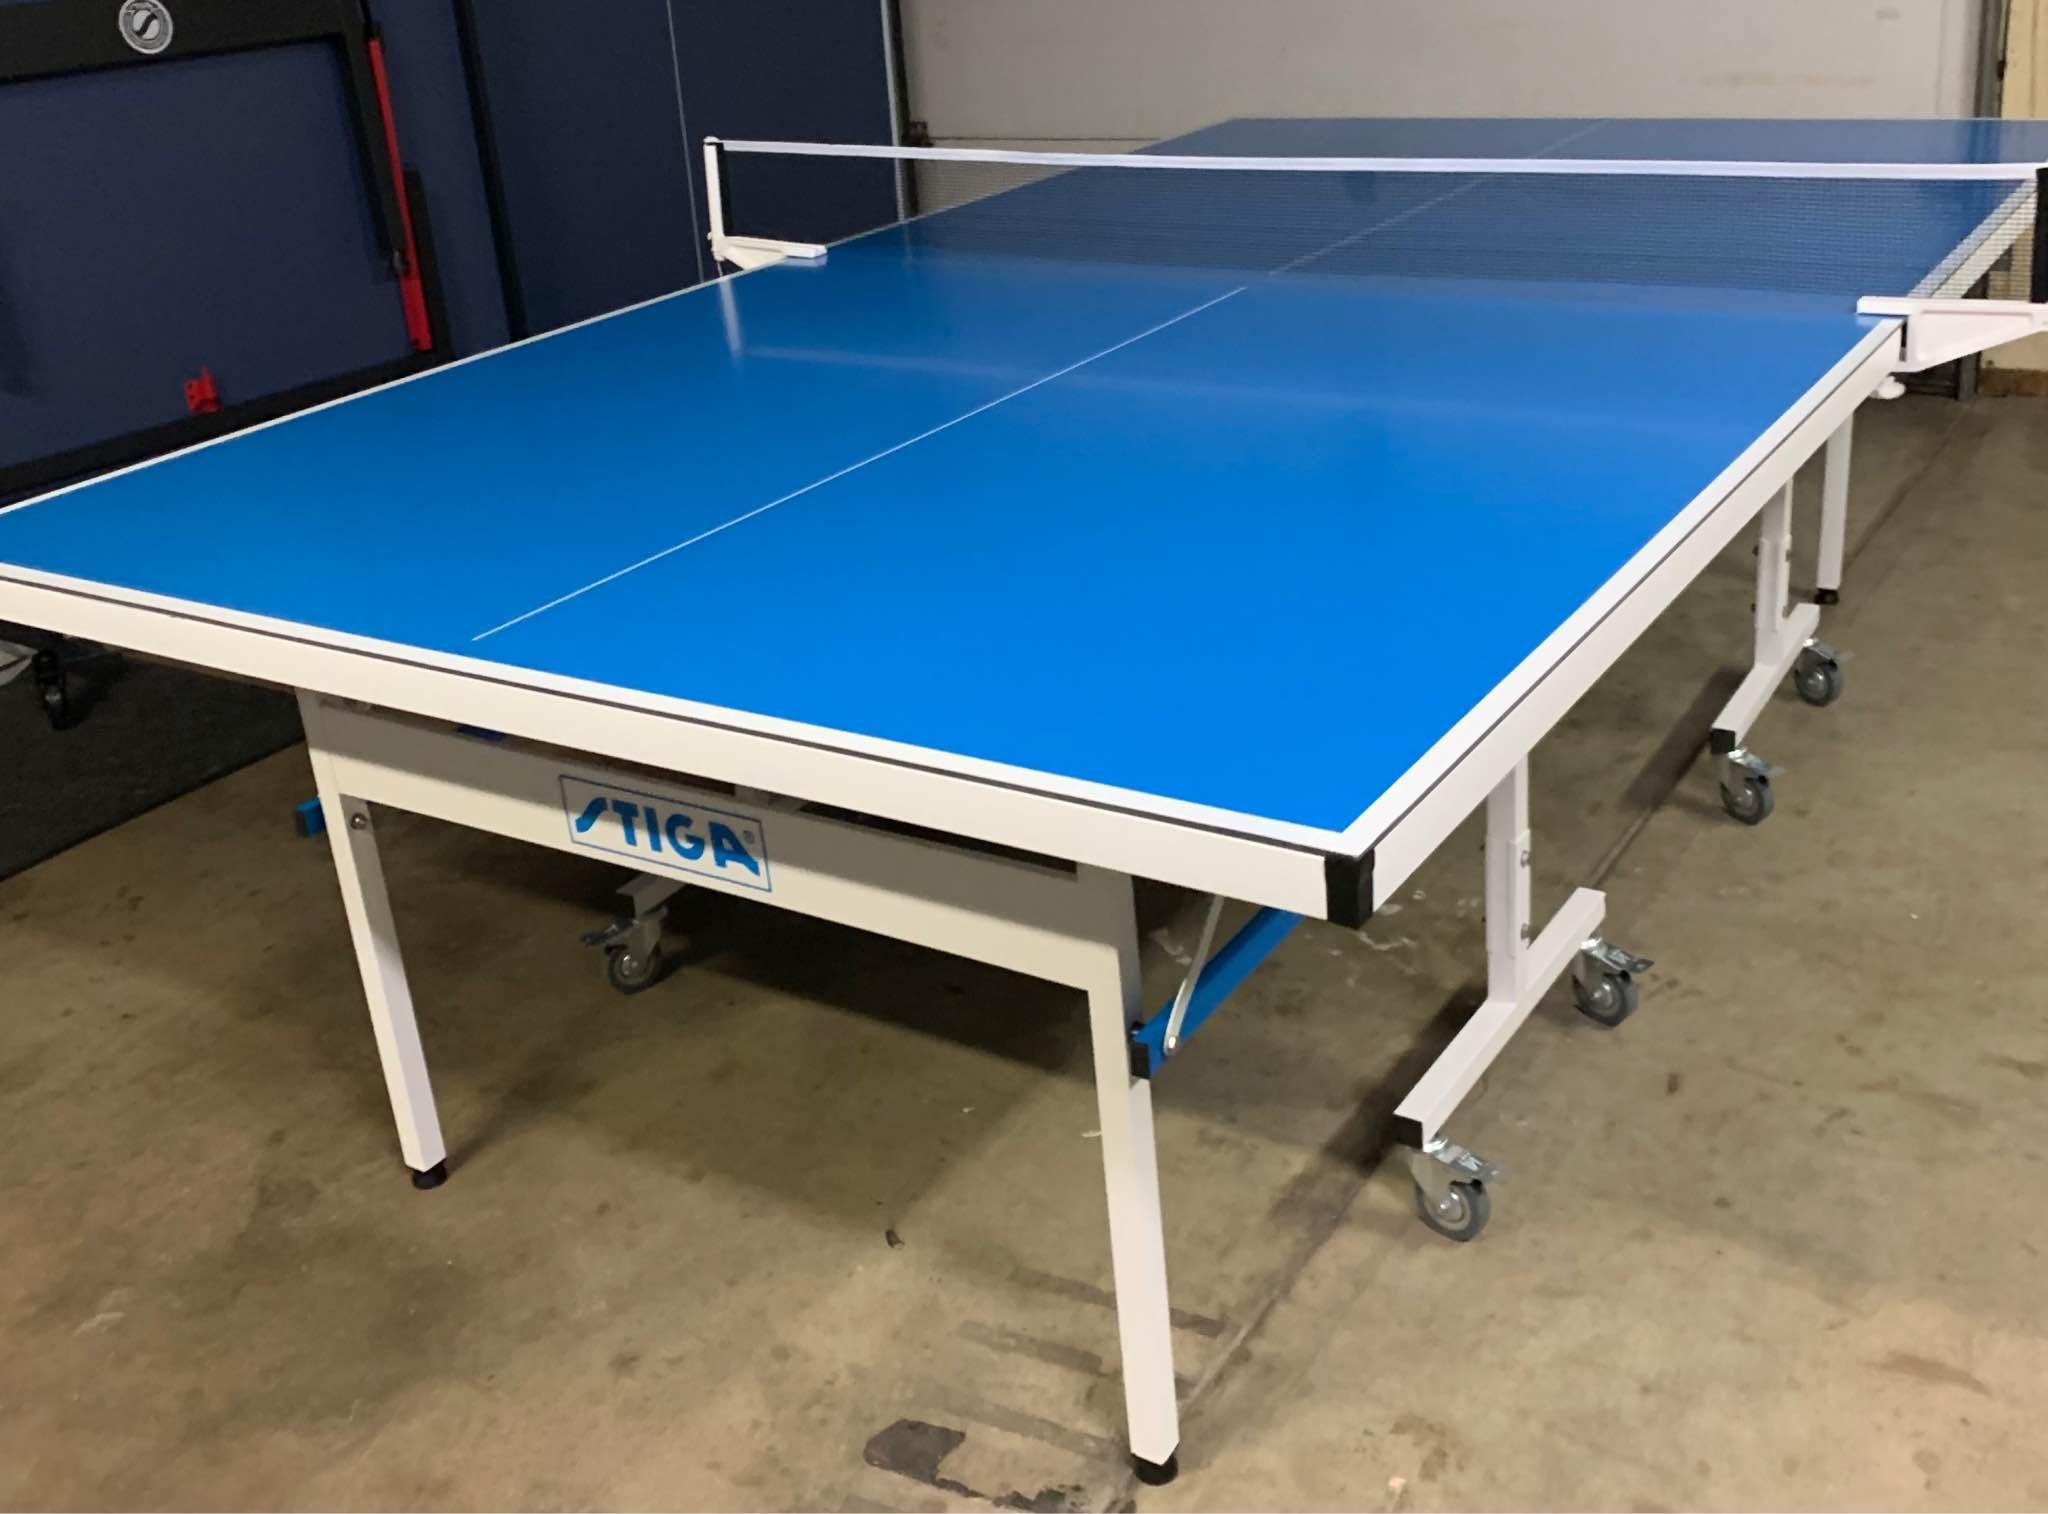 Stiga Review - Stiga Aluminum Ping Pong Table